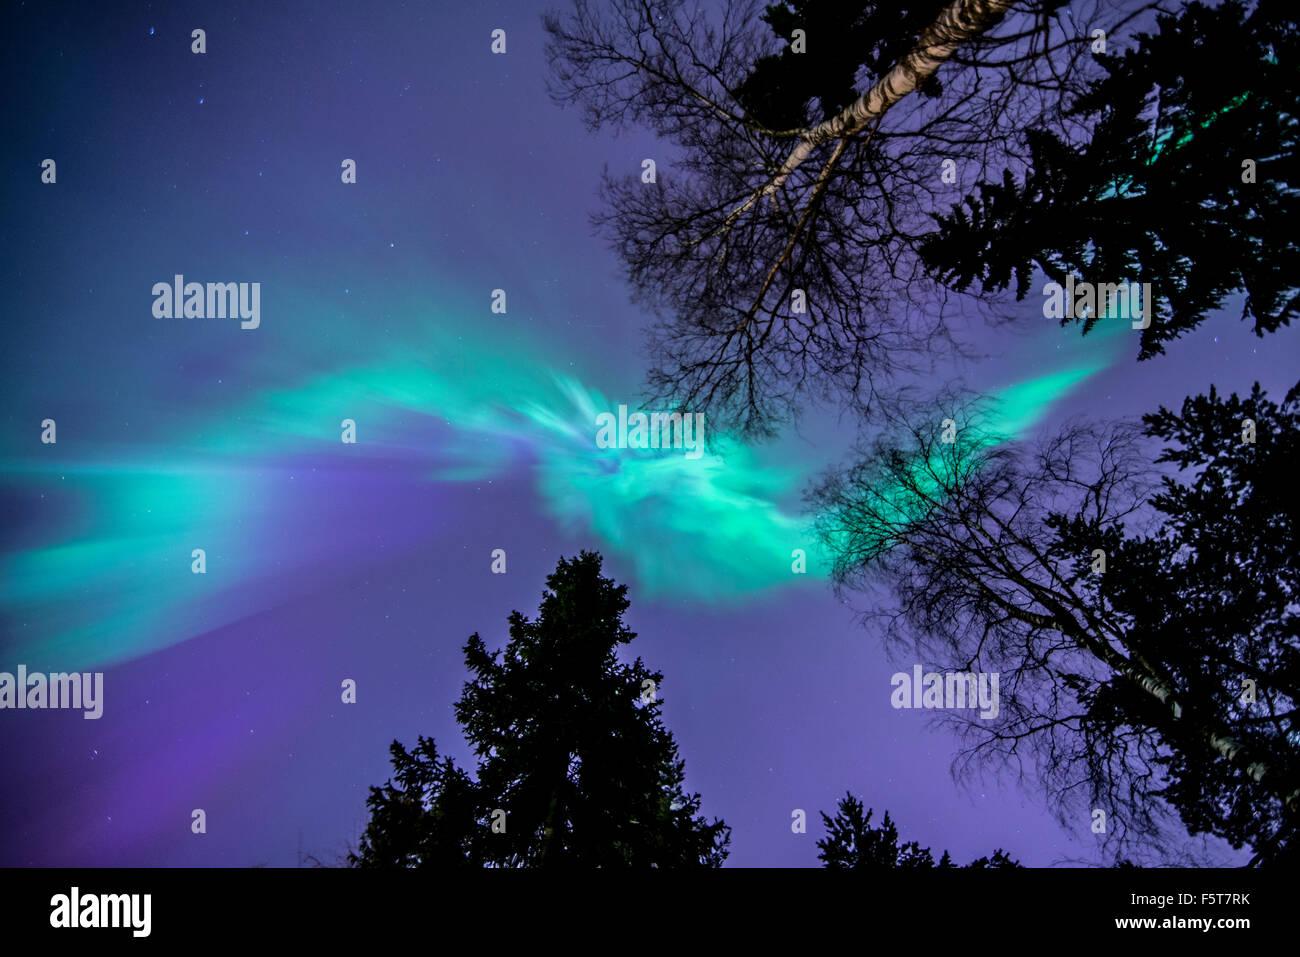 Finland, Pohjois-Pohjanmaa, Oulu, Aurora borealis - Stock Image